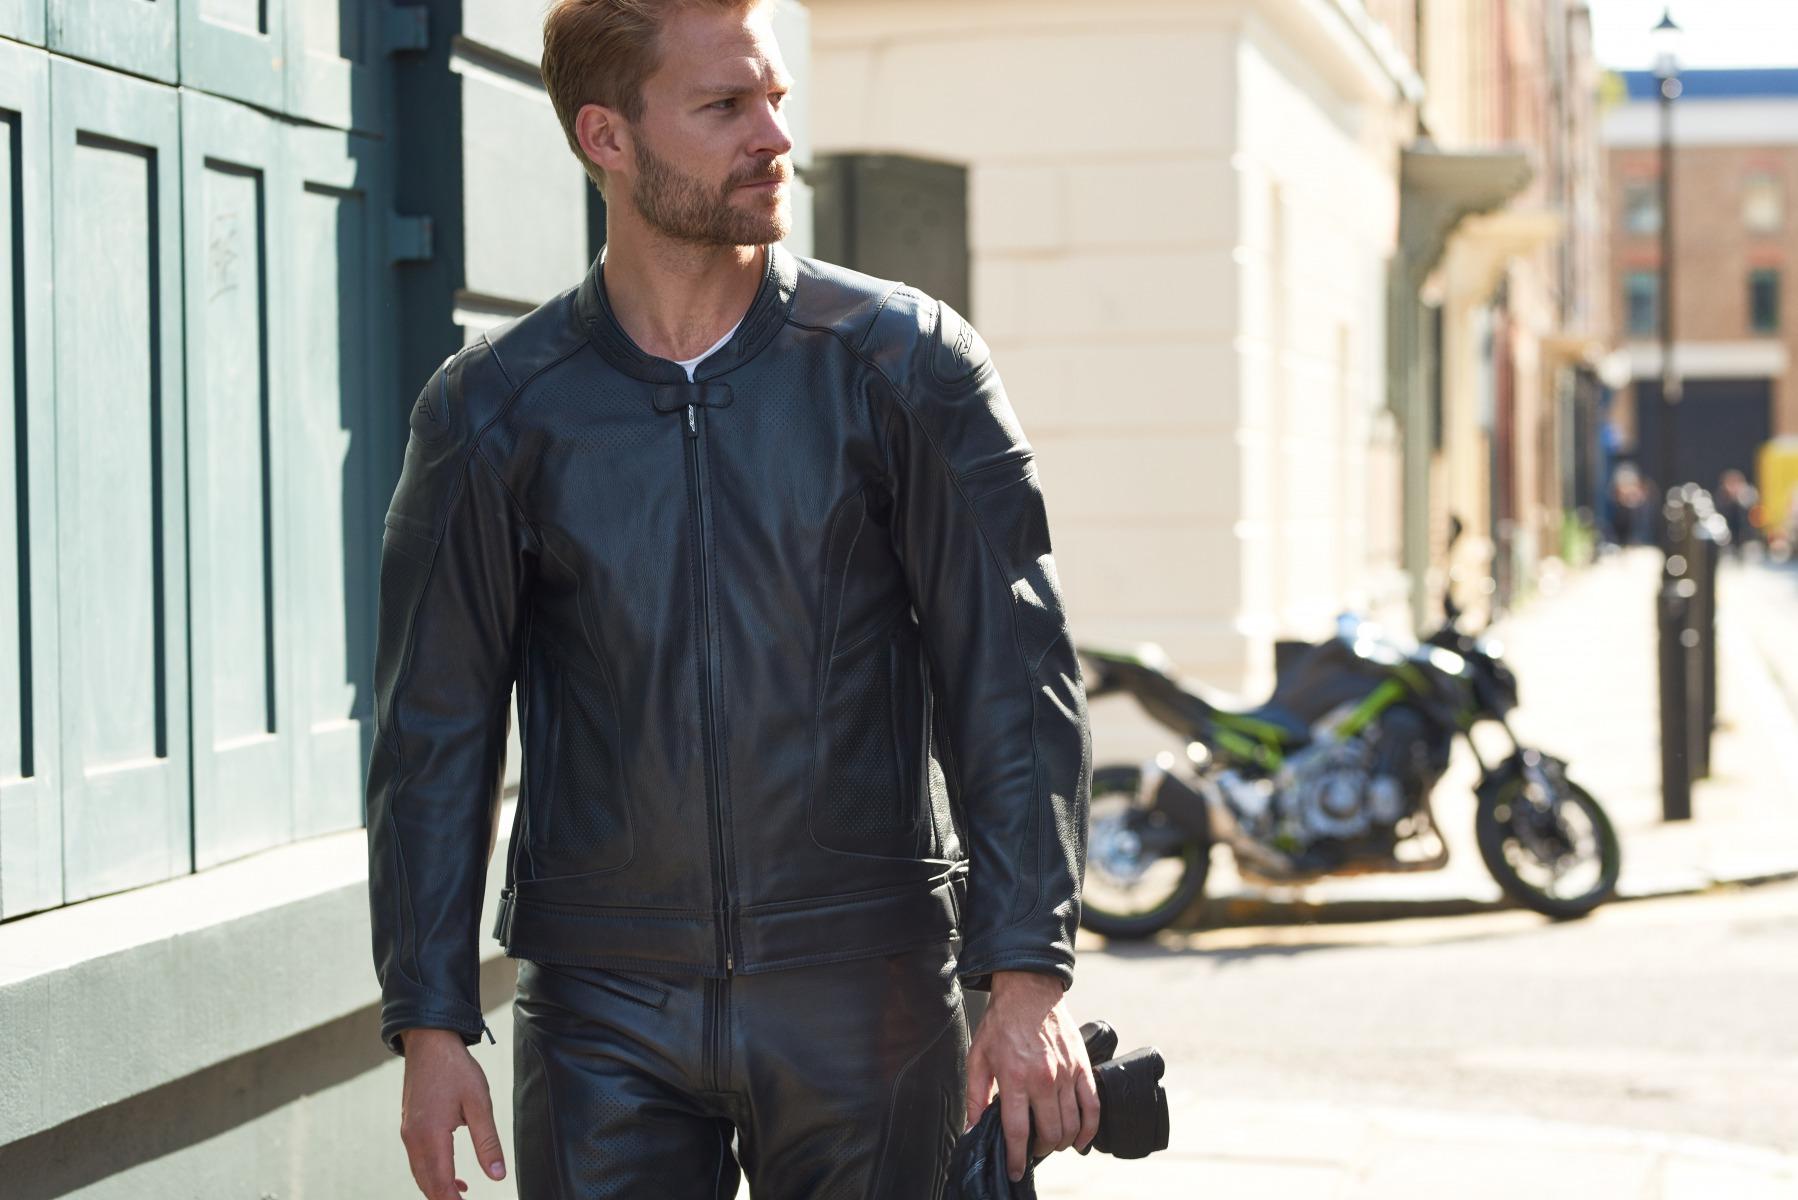 102190-rst-gt-leather-jacket-black-lifestyle-01